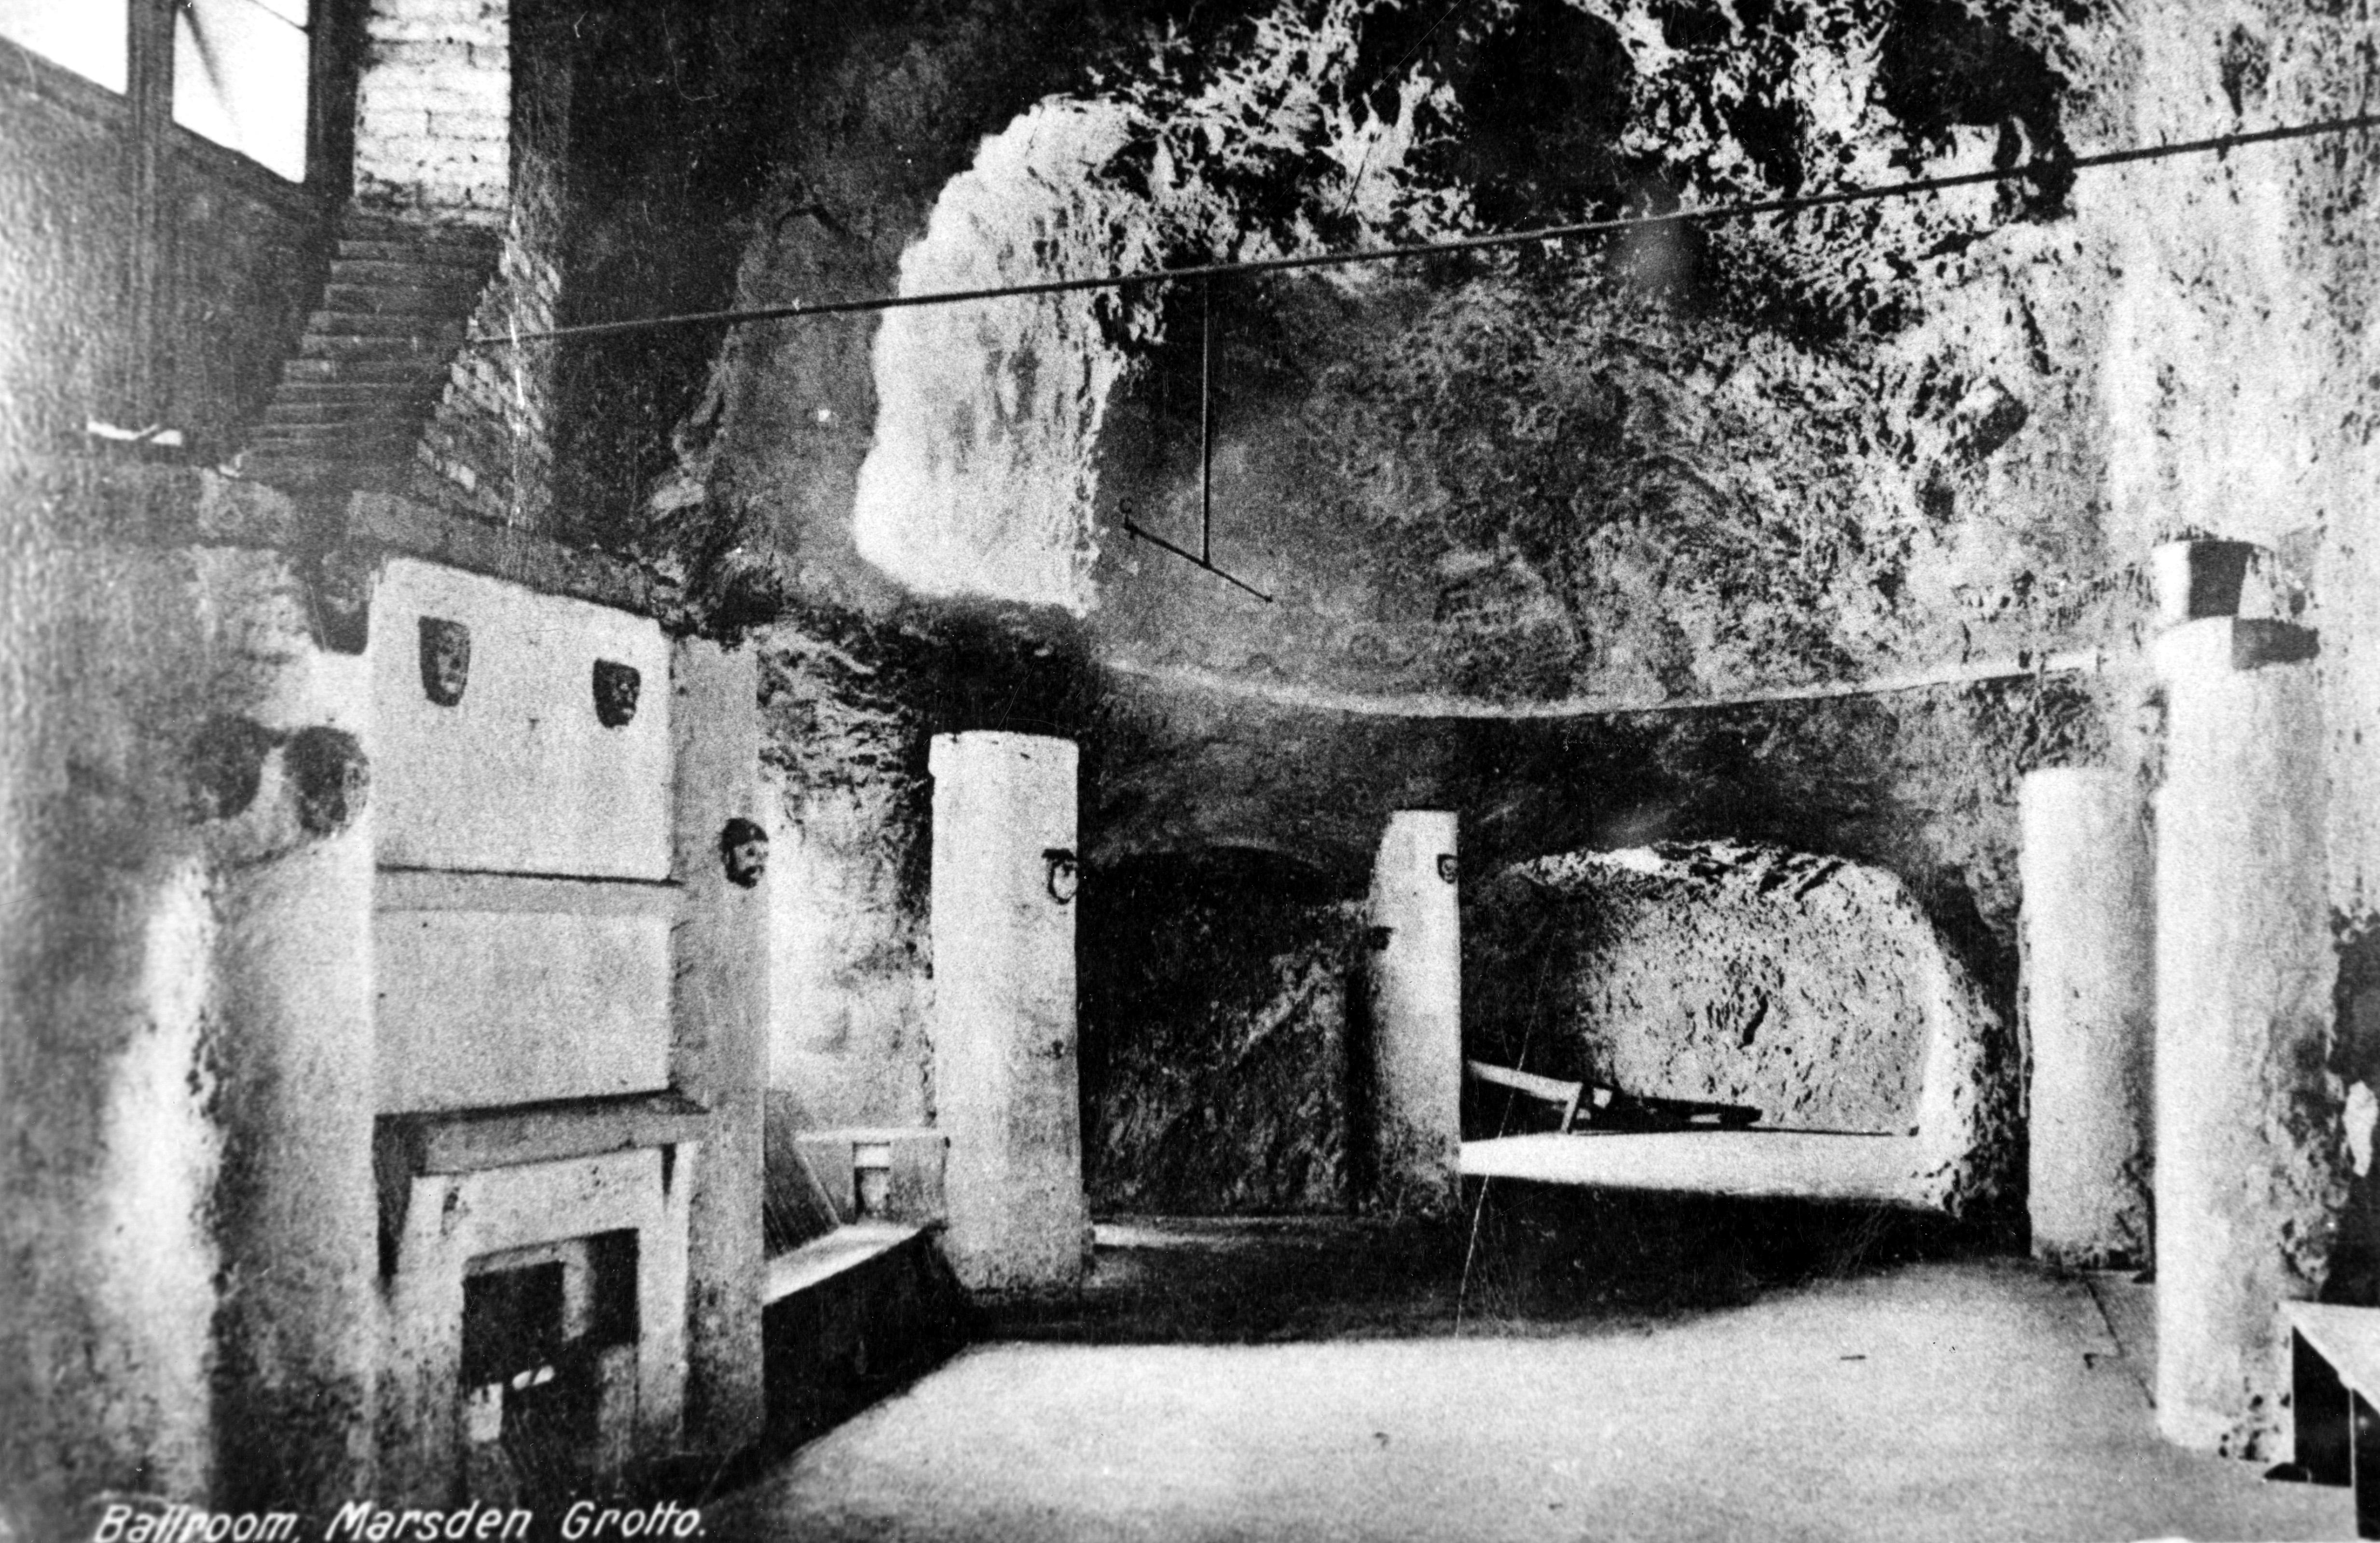 Marsden Grotto